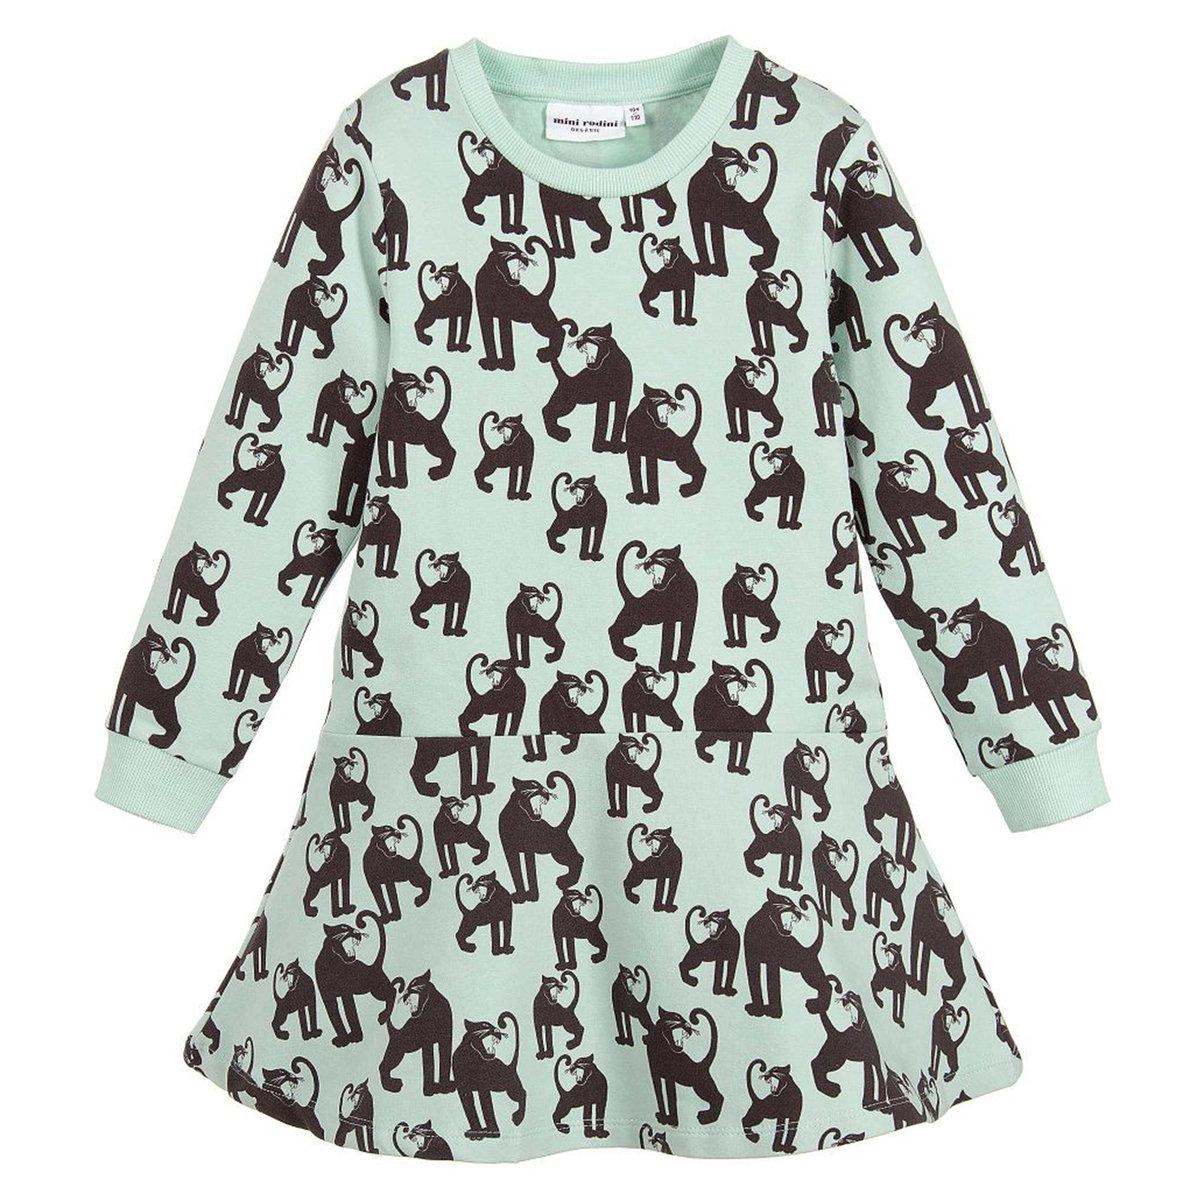 Sale - Panther Dress - Mini Rodini Mini Rodini 875PEym